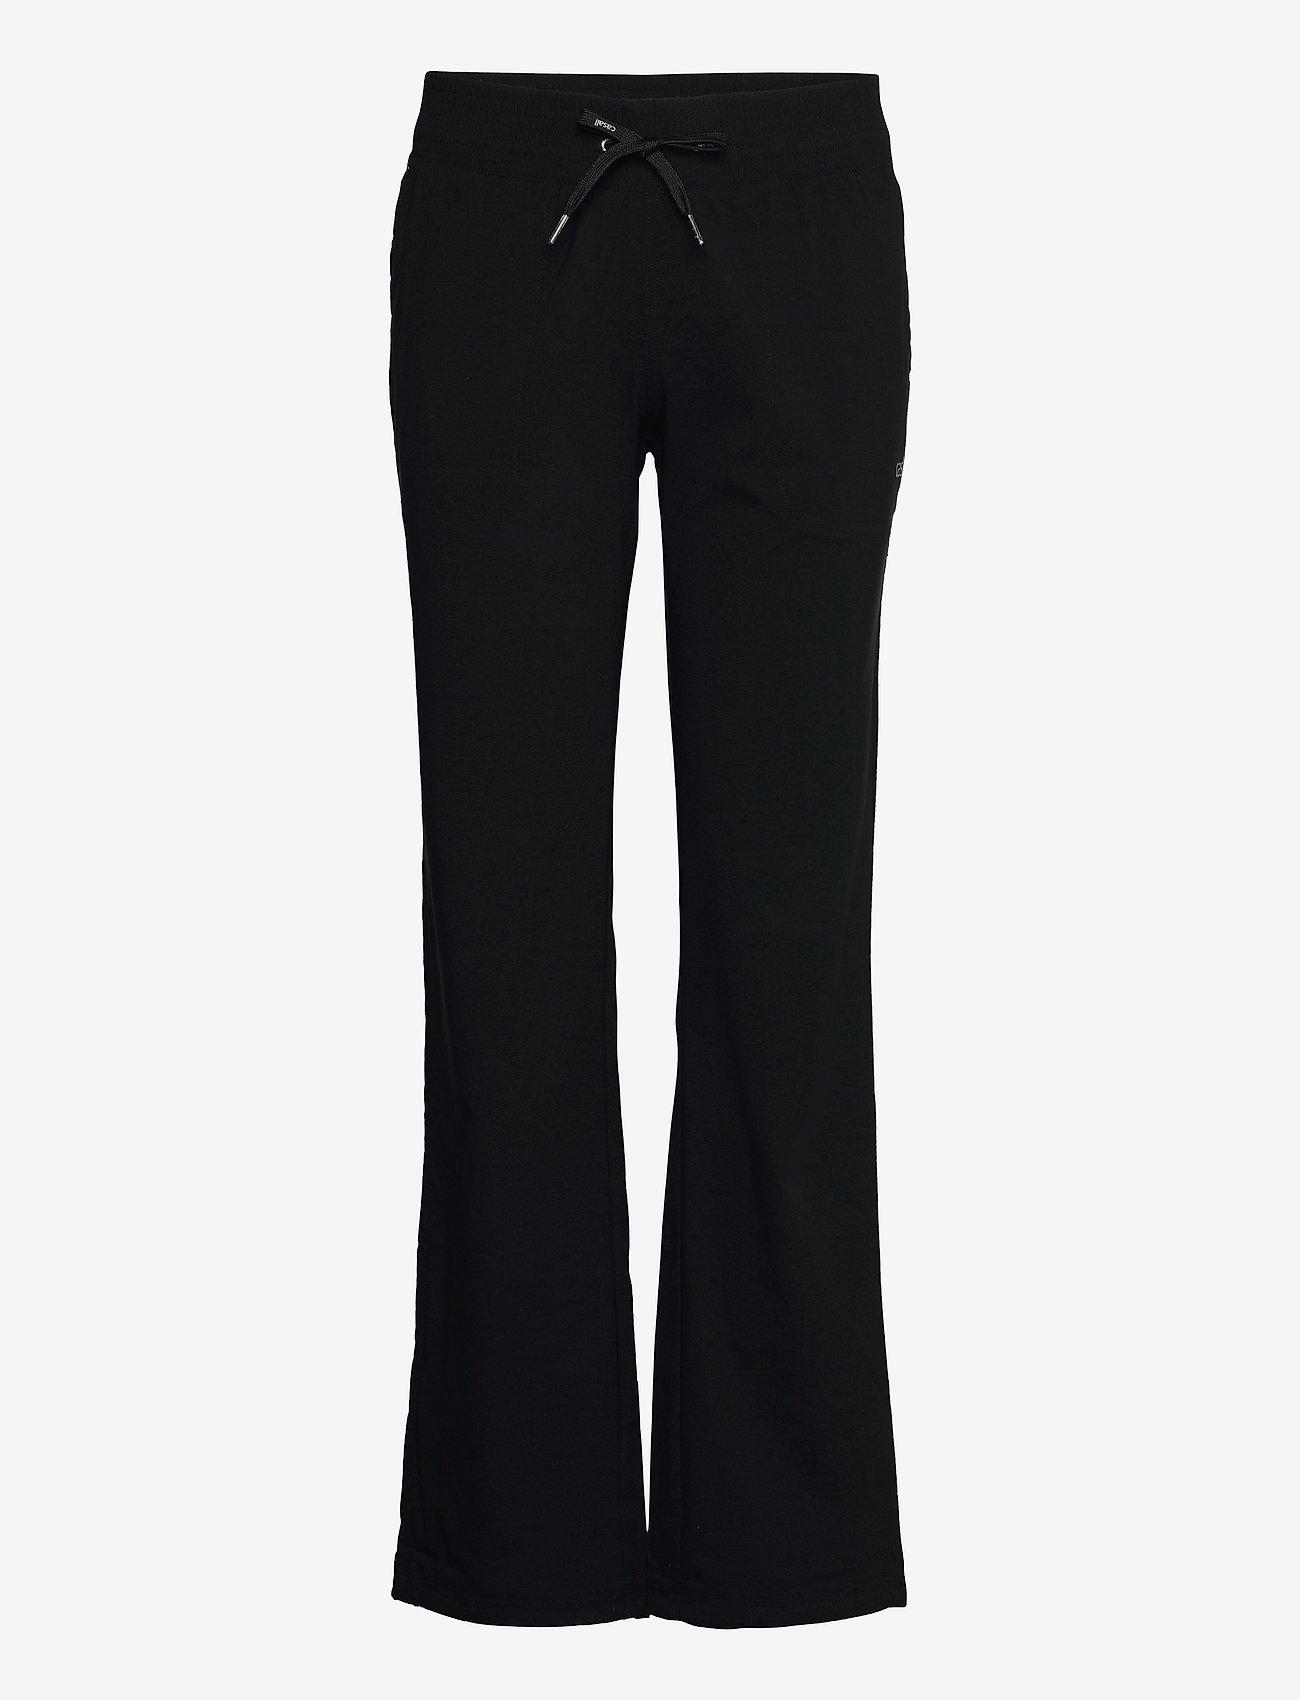 Casall - Essential Flex pants - spodnie treningowe - black - 0